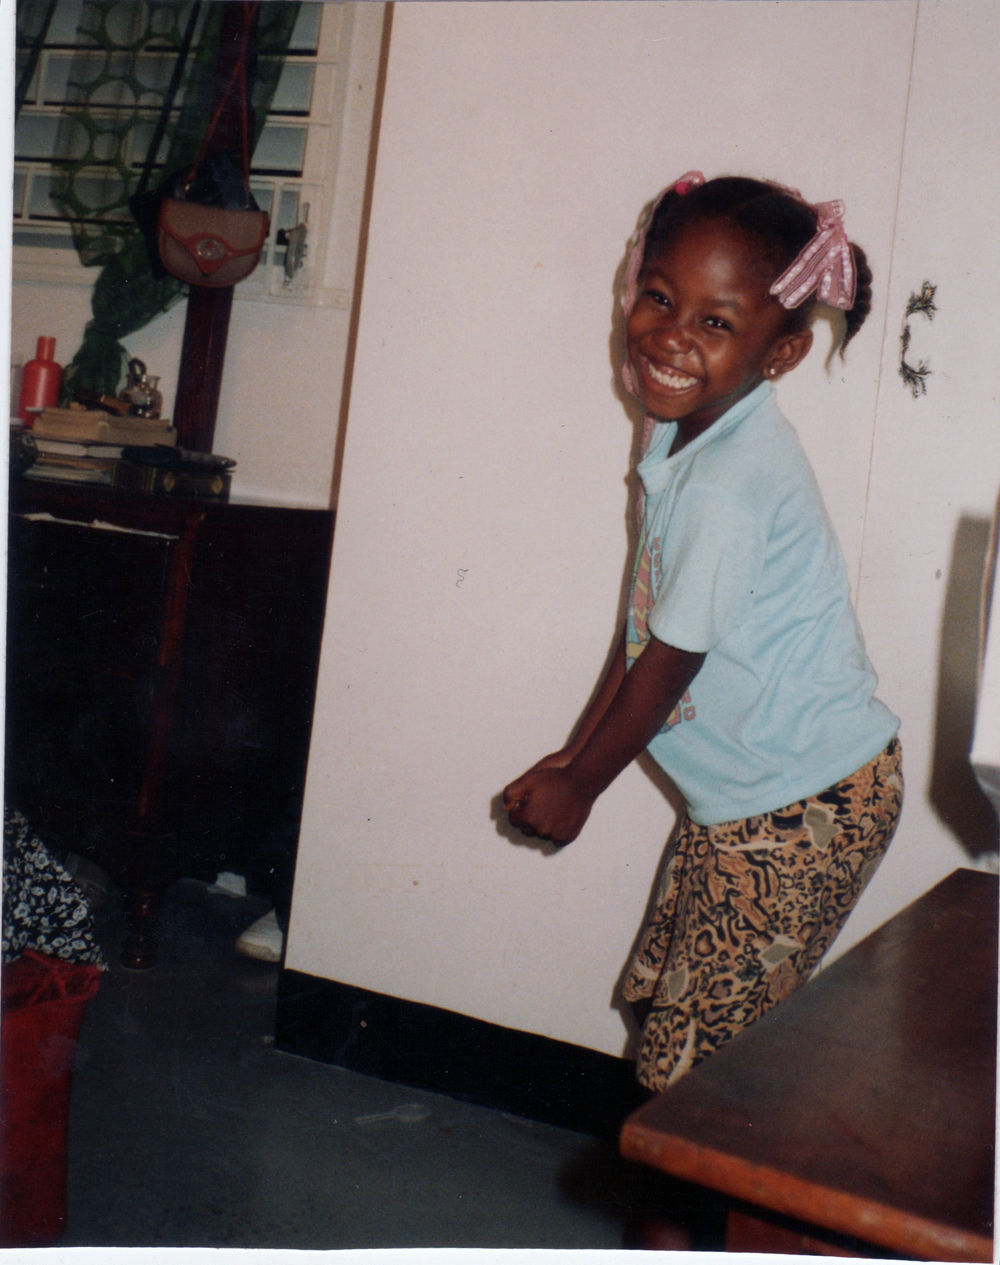 Anita_7 years old.jpg